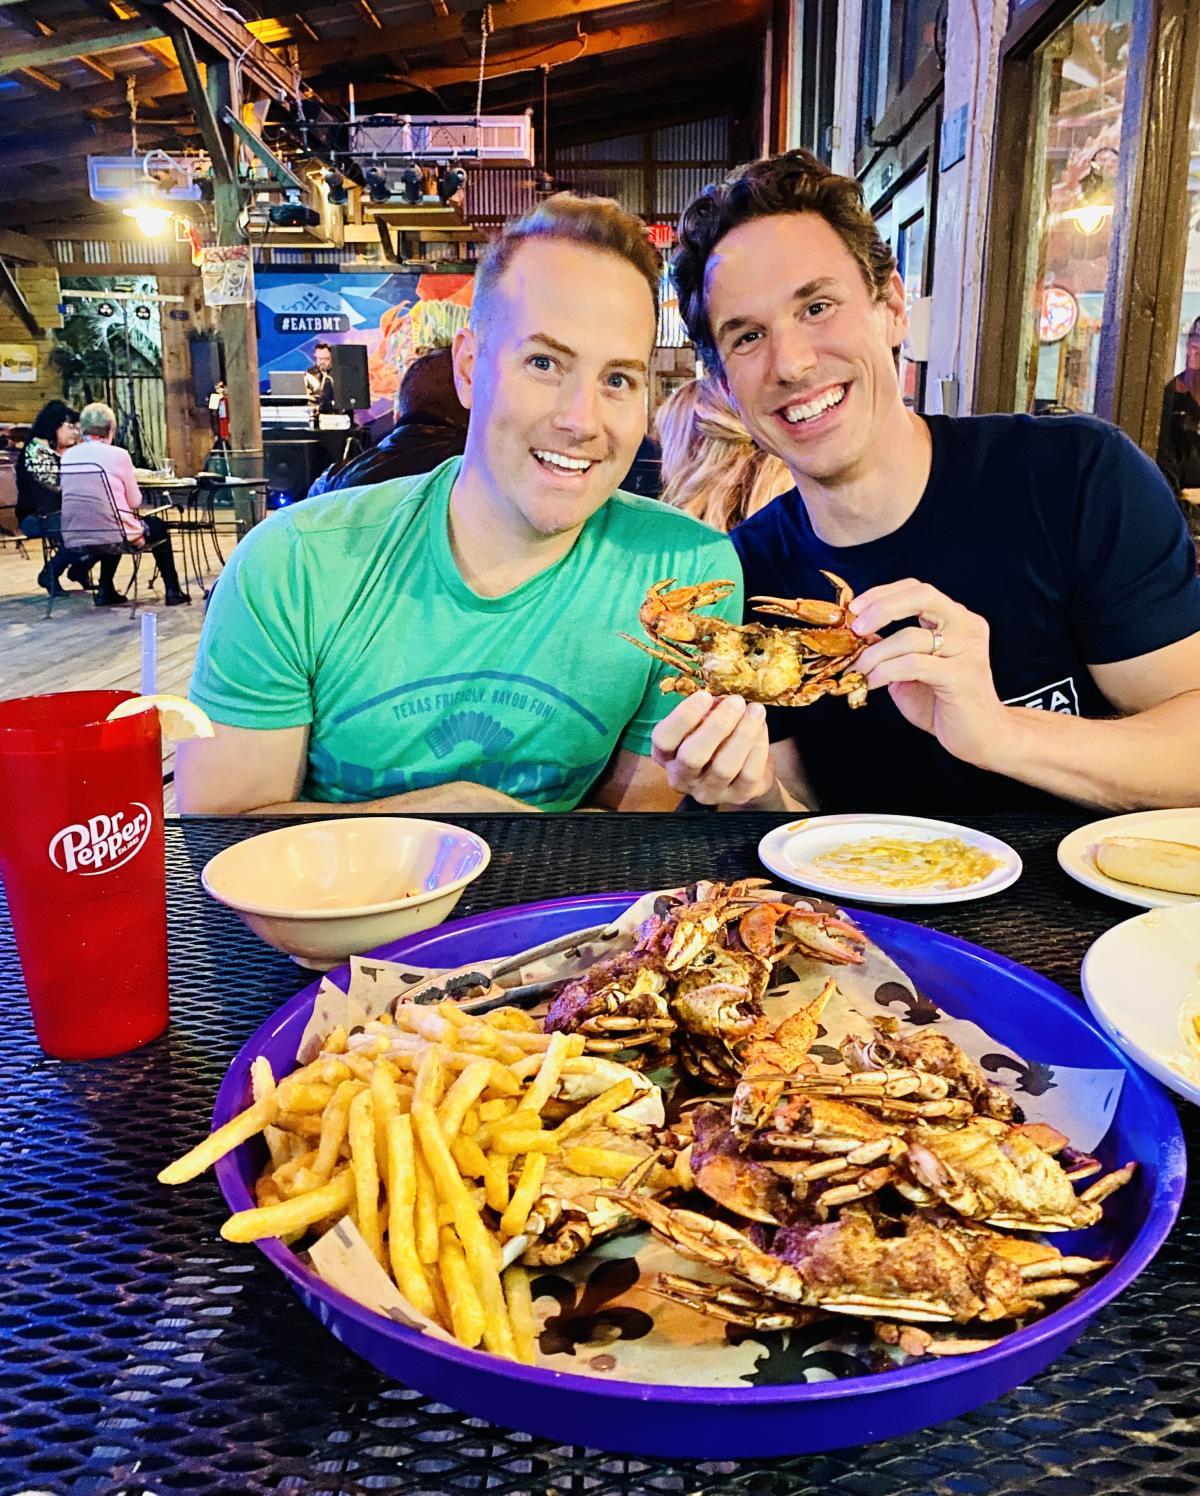 Friends enjoy a seafood platter at Beaumont's Crazy Cajun restaurant.